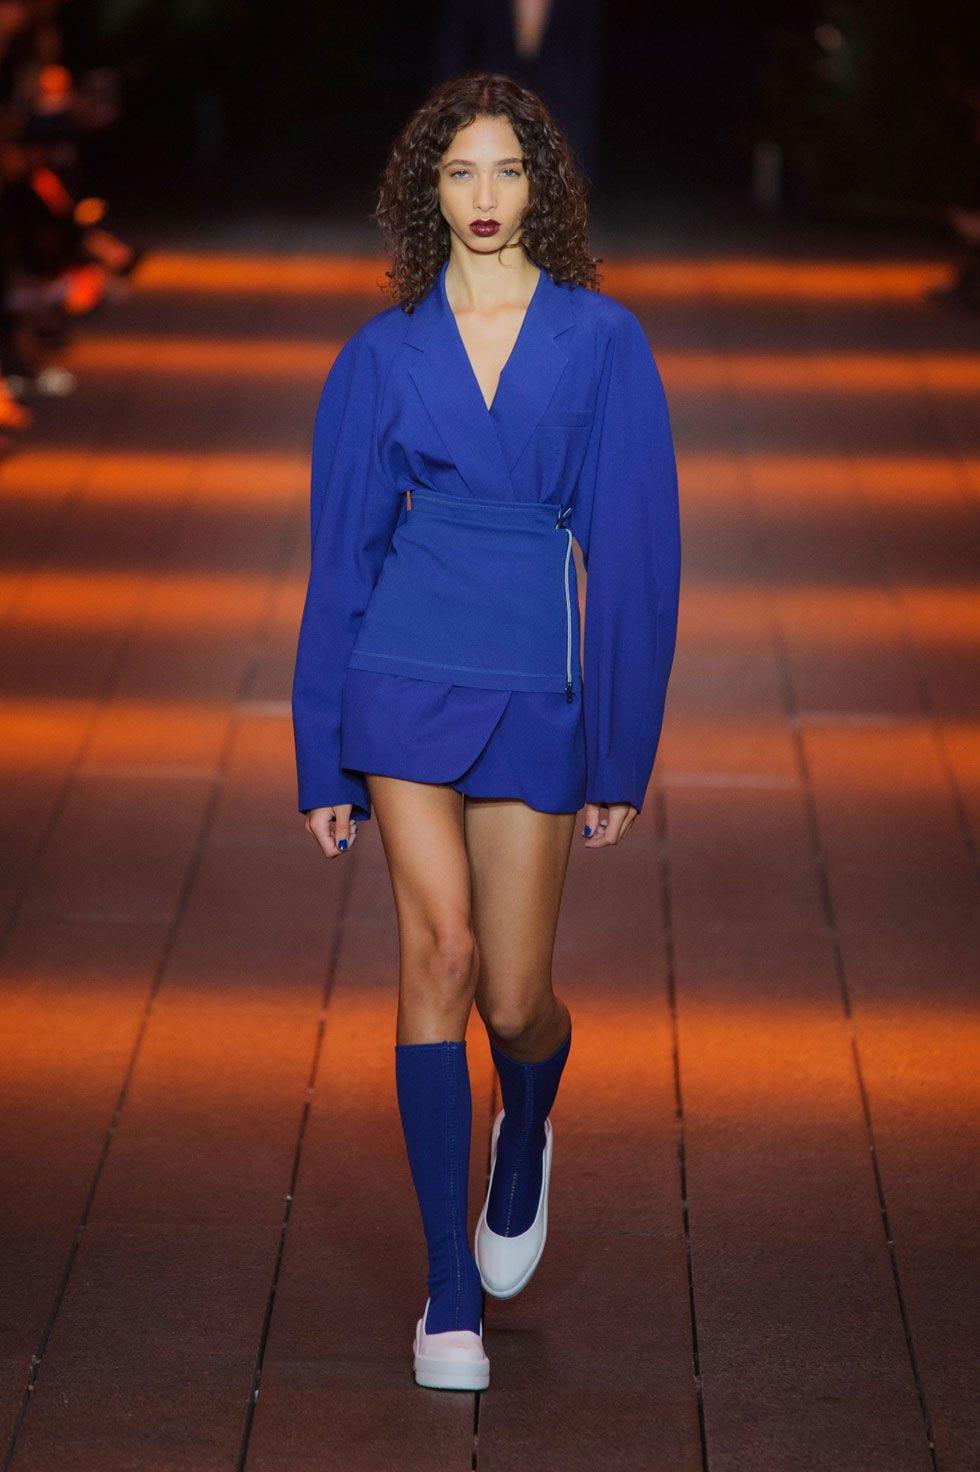 Clothing, Sleeve, Human leg, Shoulder, Style, Electric blue, Orange, Knee, Fashion show, Street fashion,